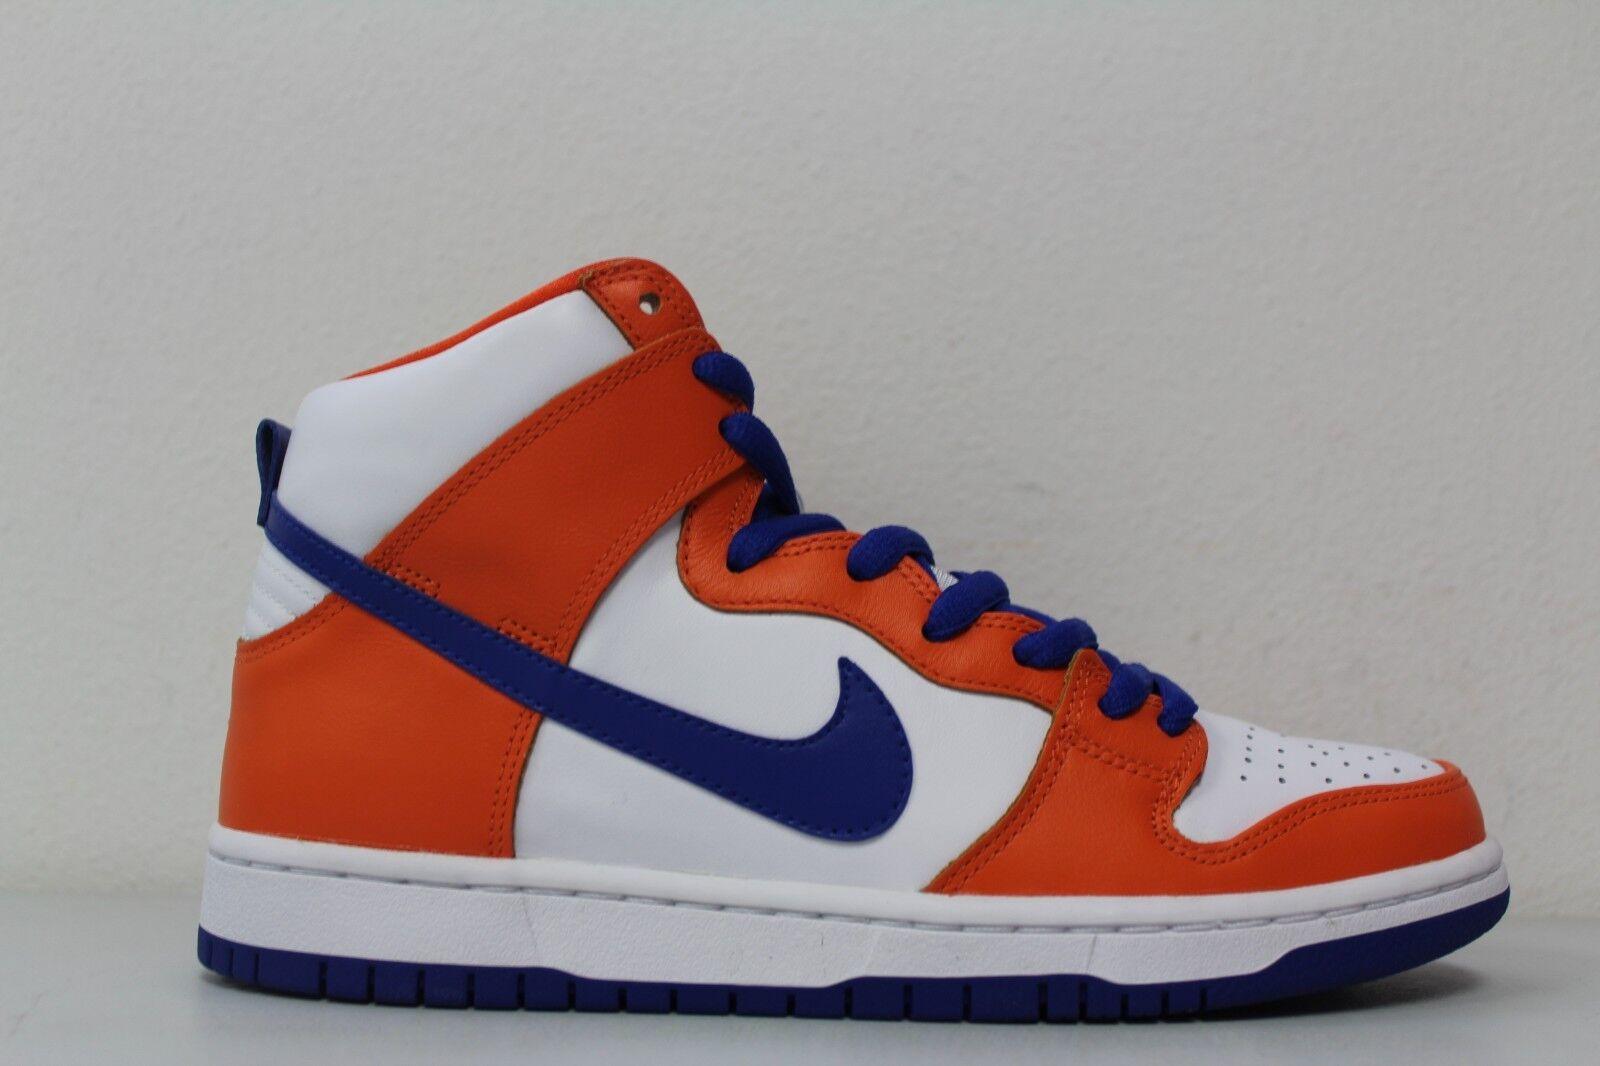 Nike Mens SB Dunk High TRD QS Size 9 Danny Supa Safety Orange Blue AH0471-841